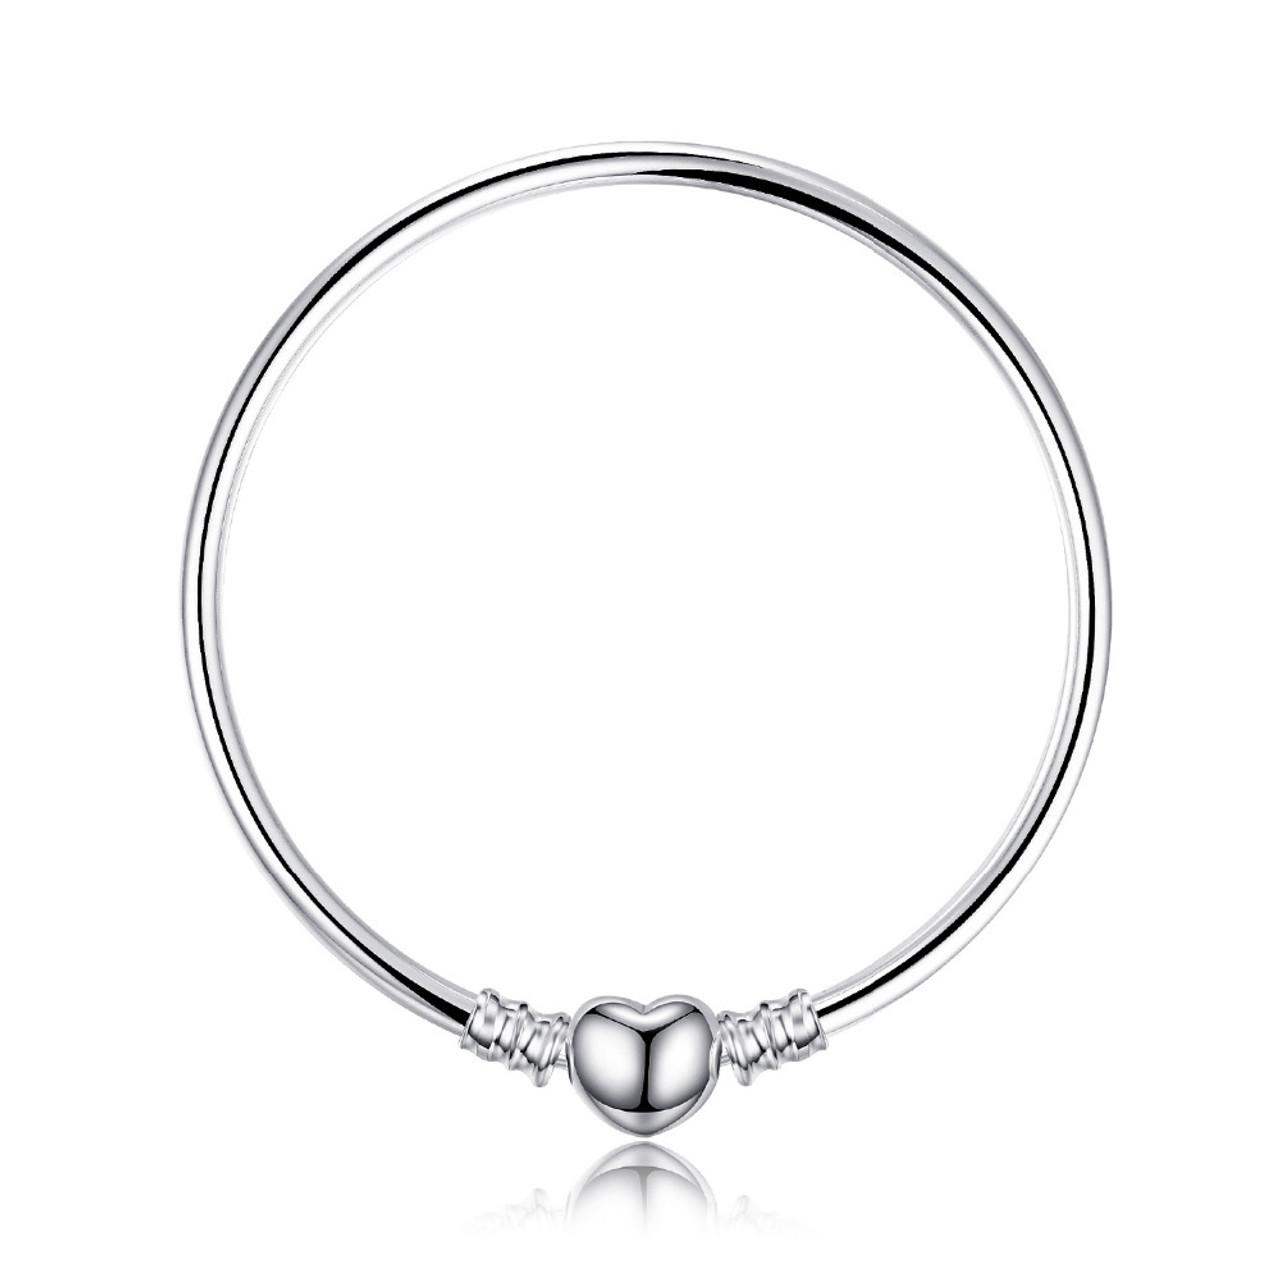 683b923e1b1e1 ... Jewelrypalace 925 Sterling Silver Bracelets Elegant Heart Beads  Bracelet Bangle Gifts For Women Anniversary Fashion Jewelry ...